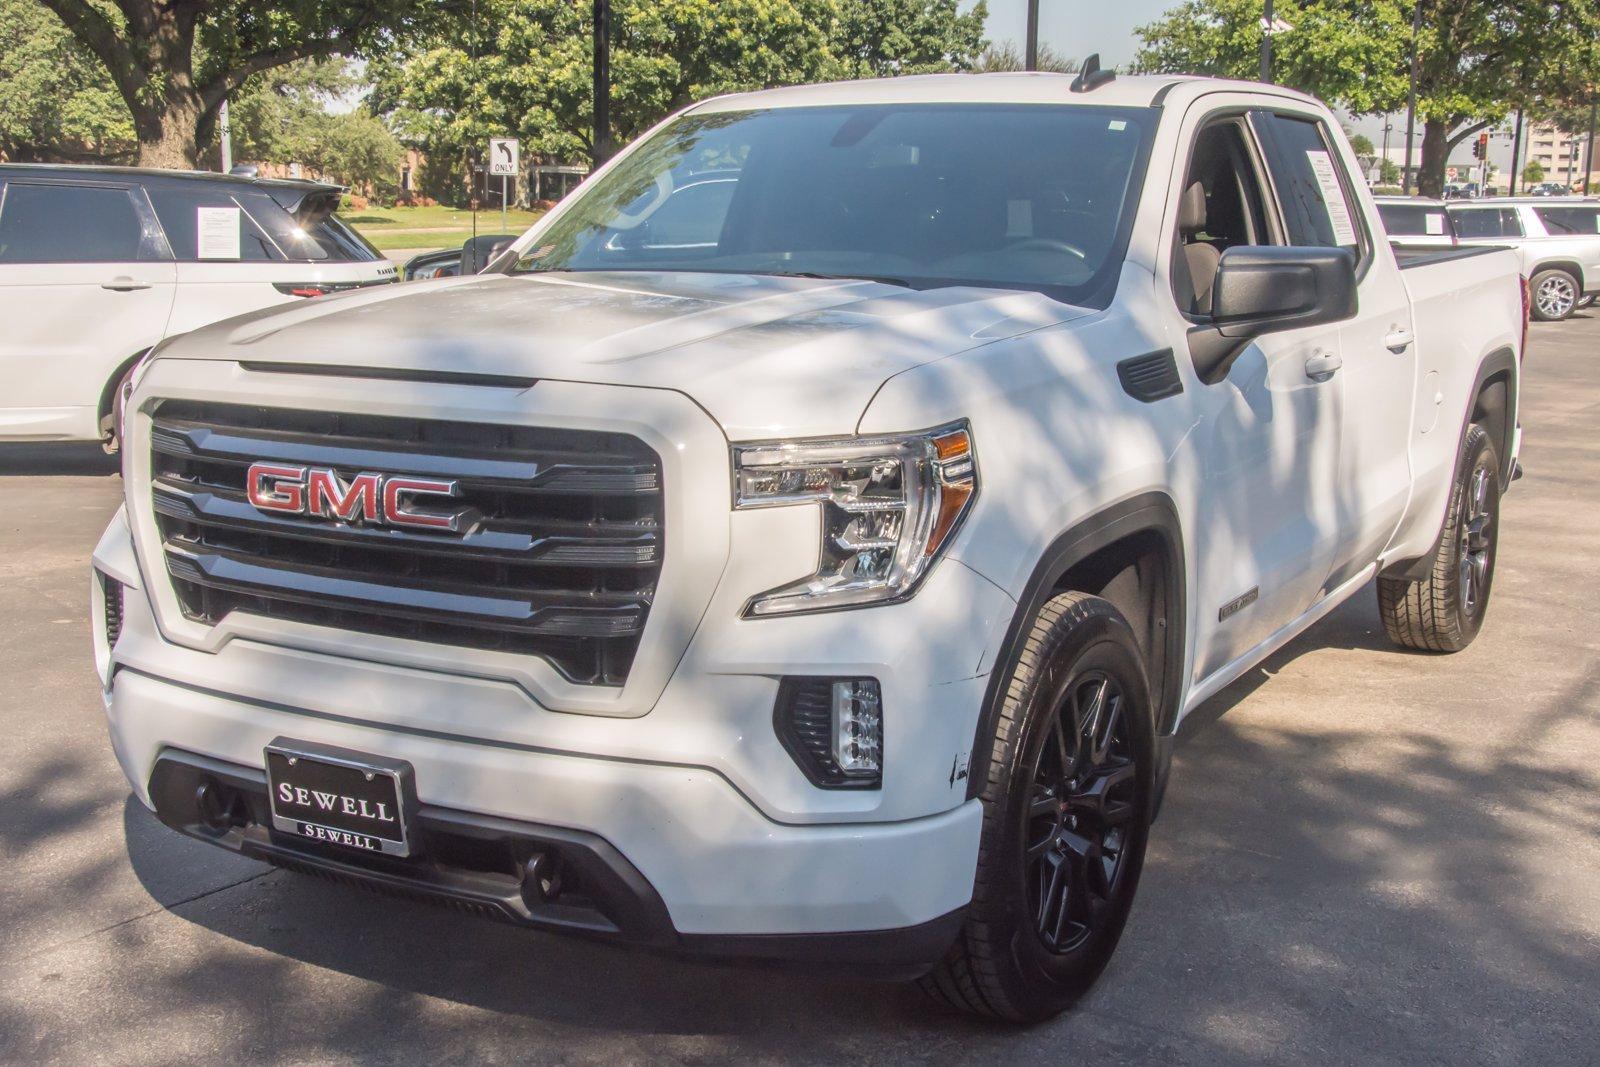 2019 GMC Sierra 1500 Vehicle Photo in Dallas, TX 75209